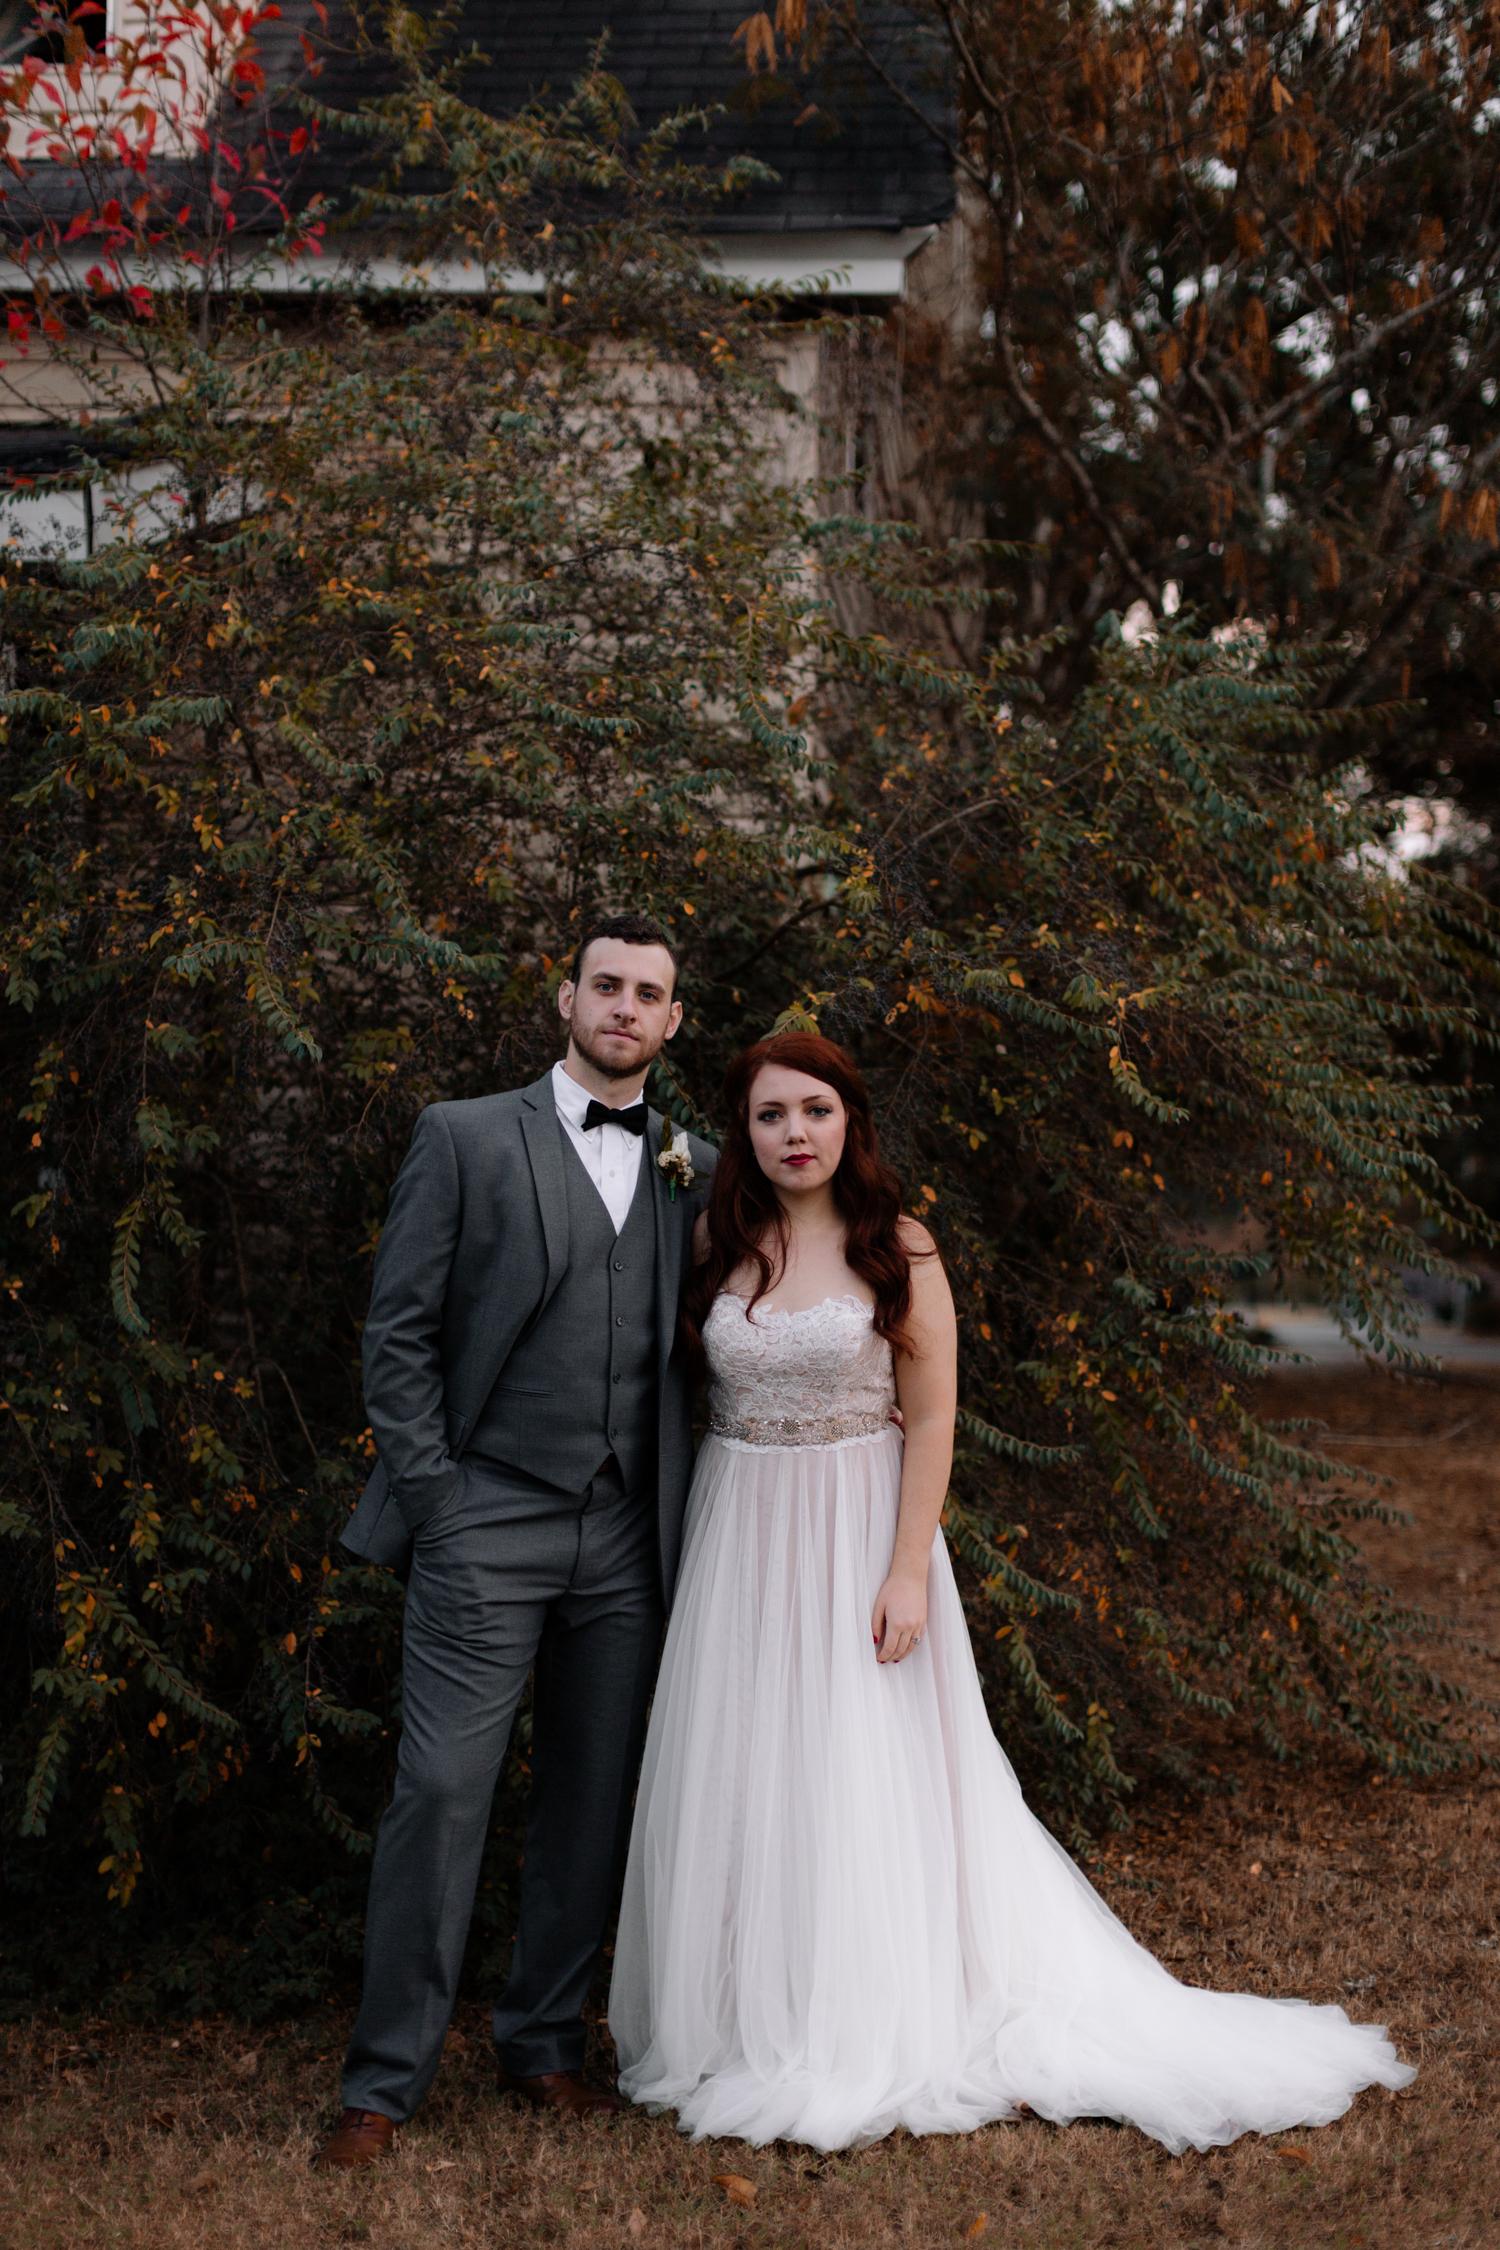 Yellow+Bird+Visuals+Destination+Wedding+Photographer-7553